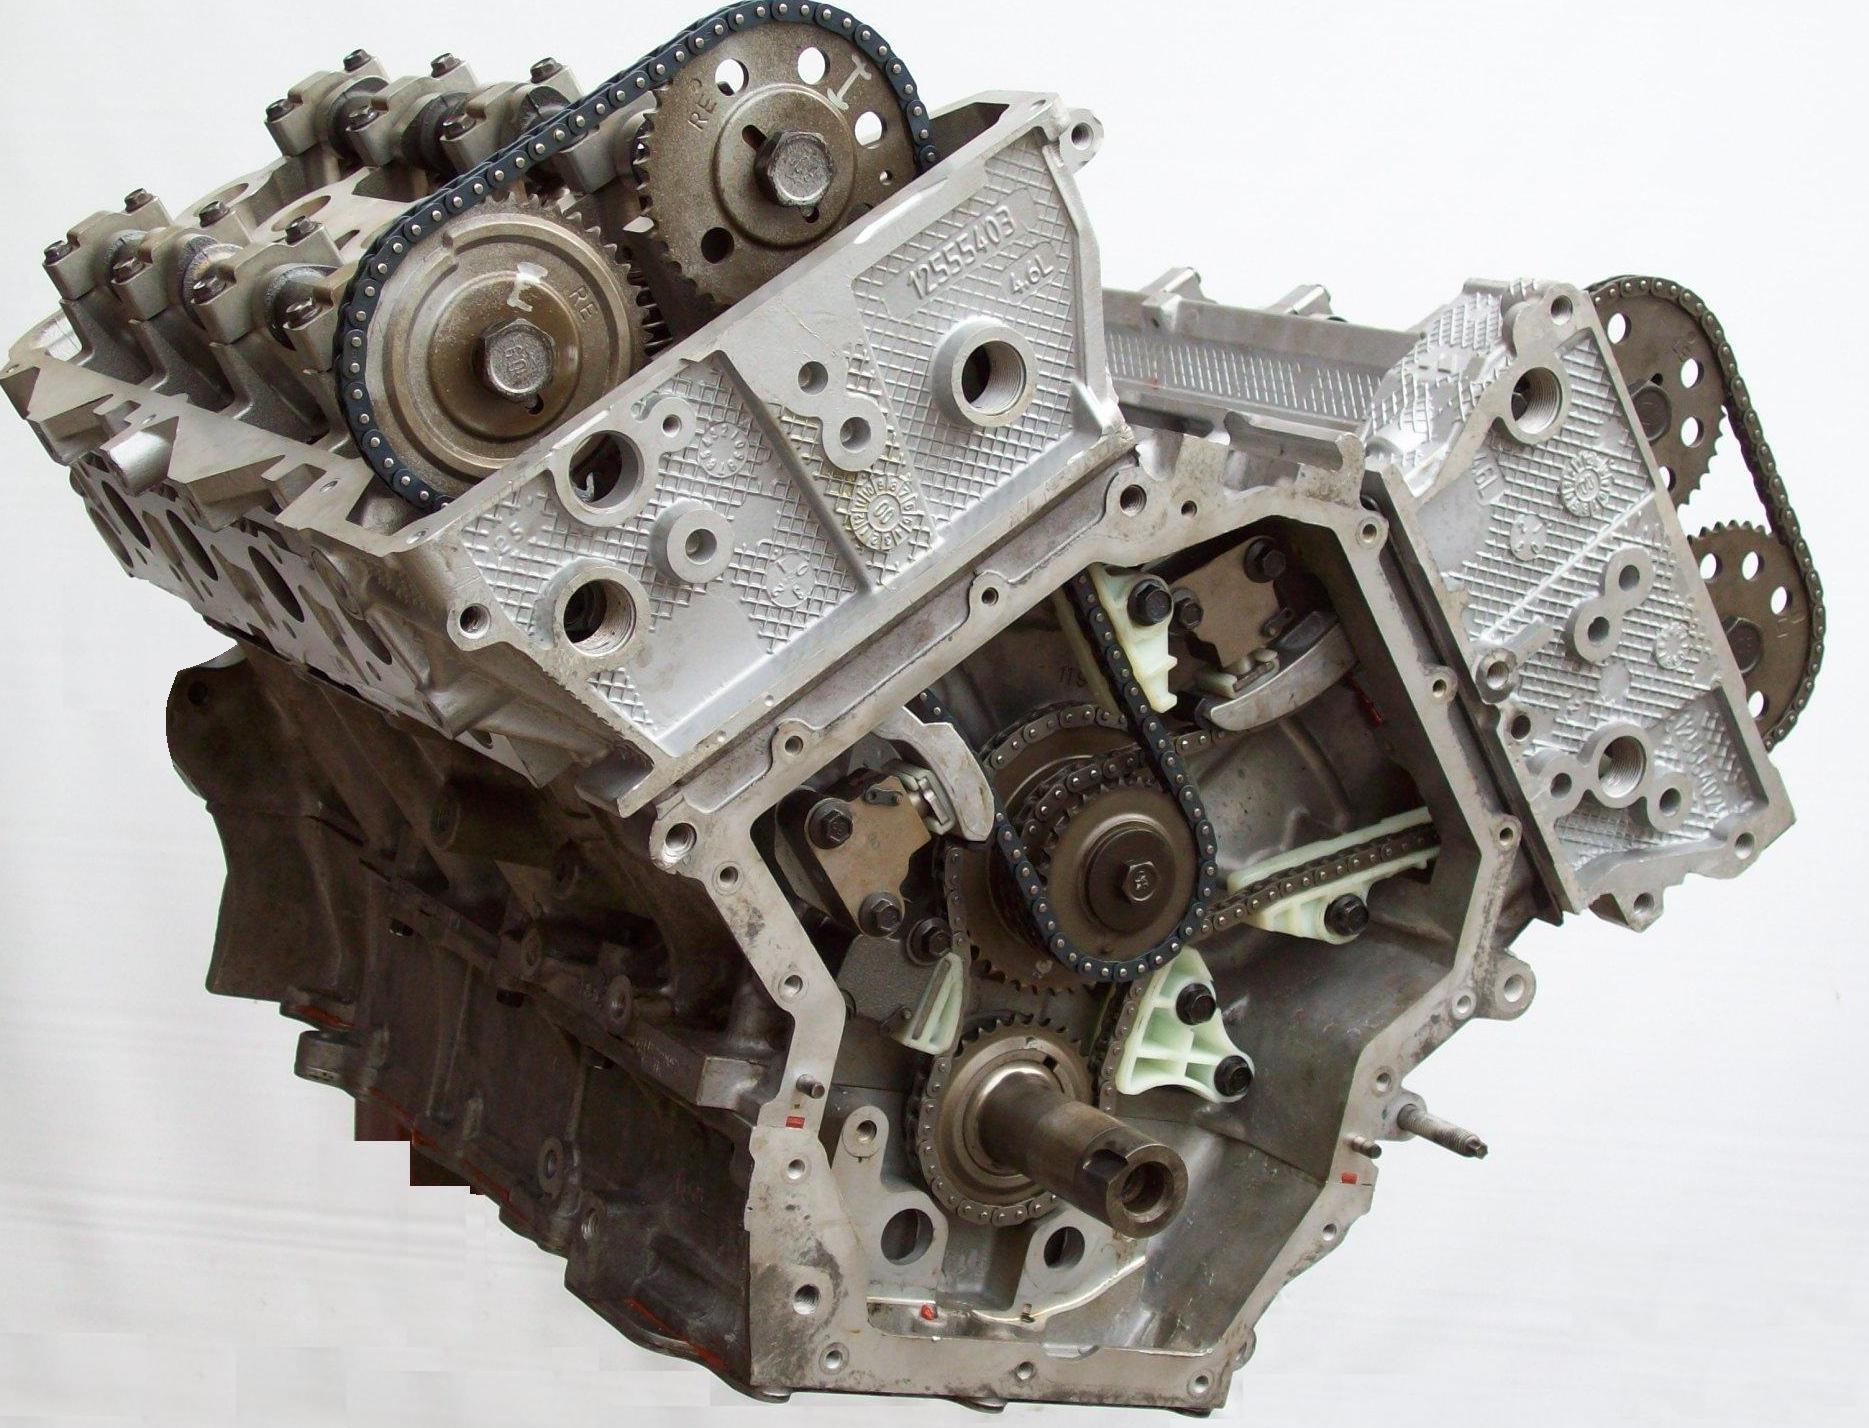 Engine Parts Diagram Furthermore Cadillac Northstar Engine Diagram